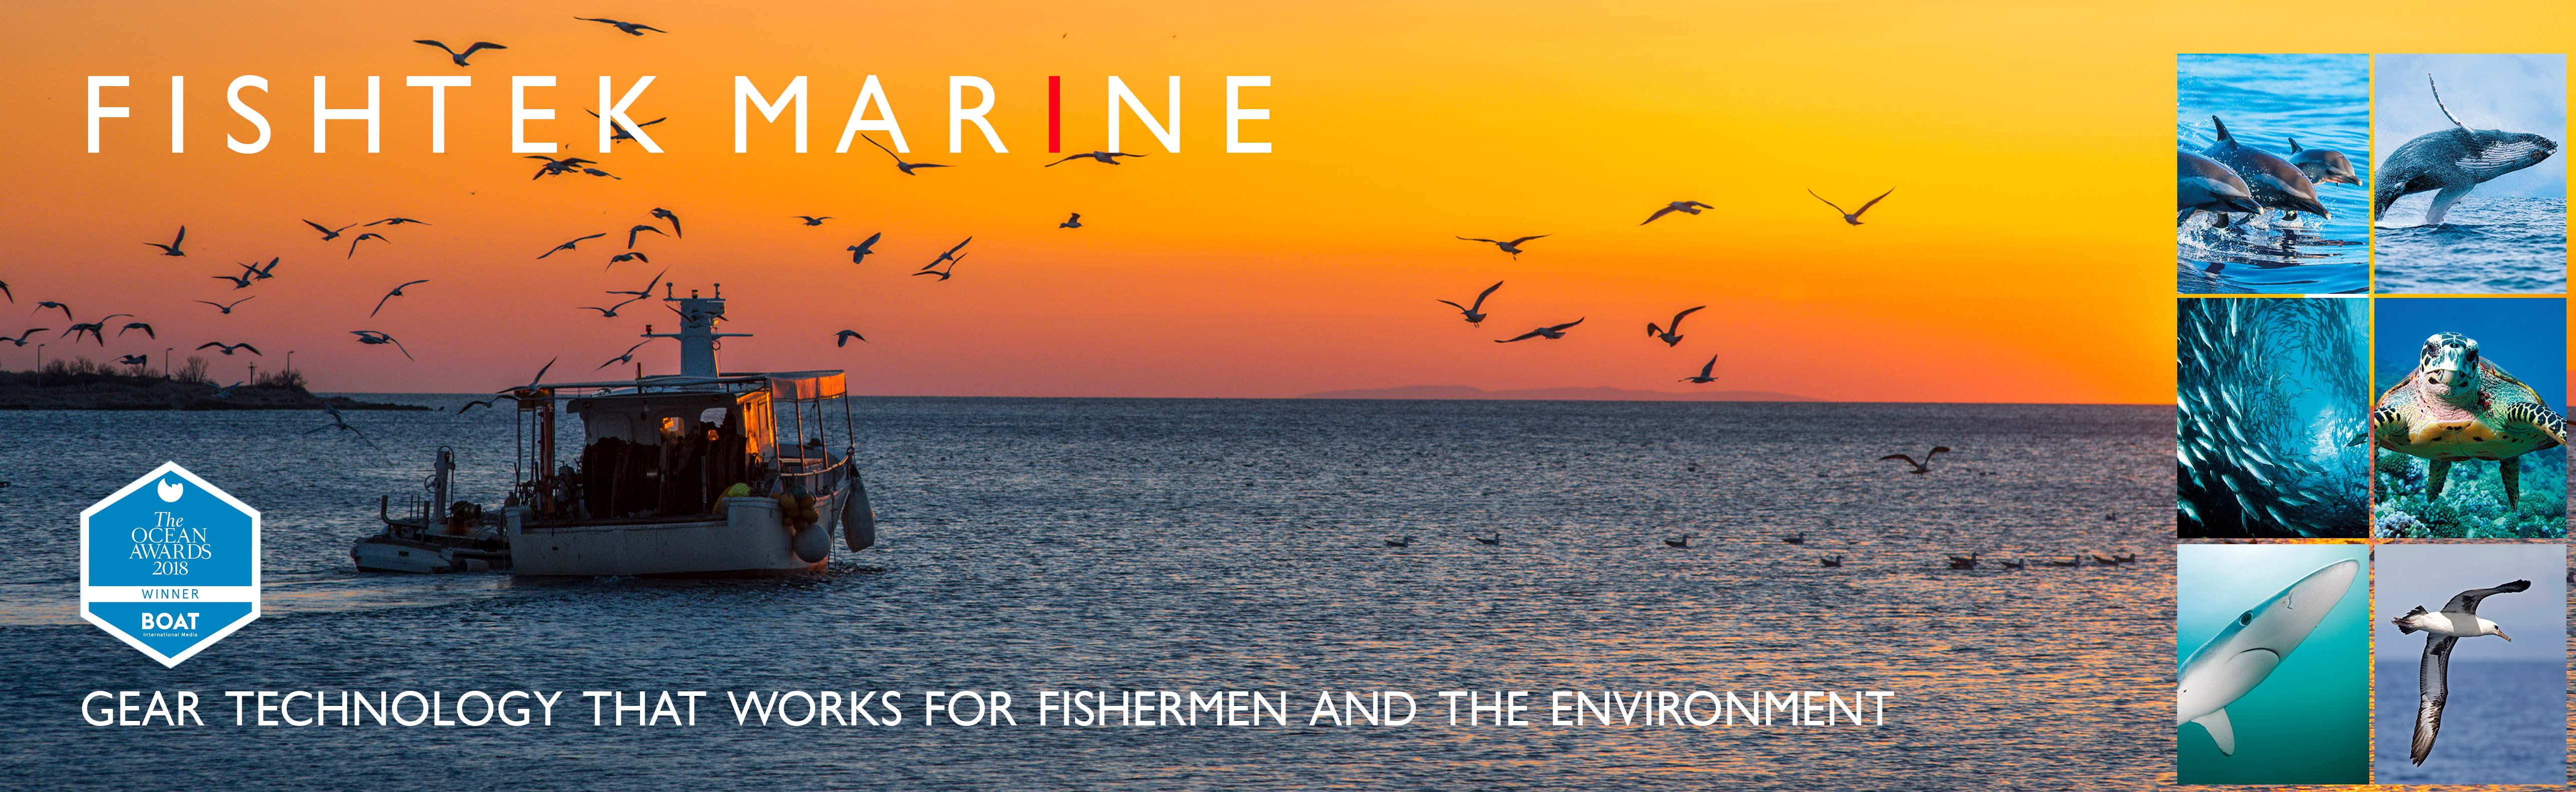 Fishtek Marine